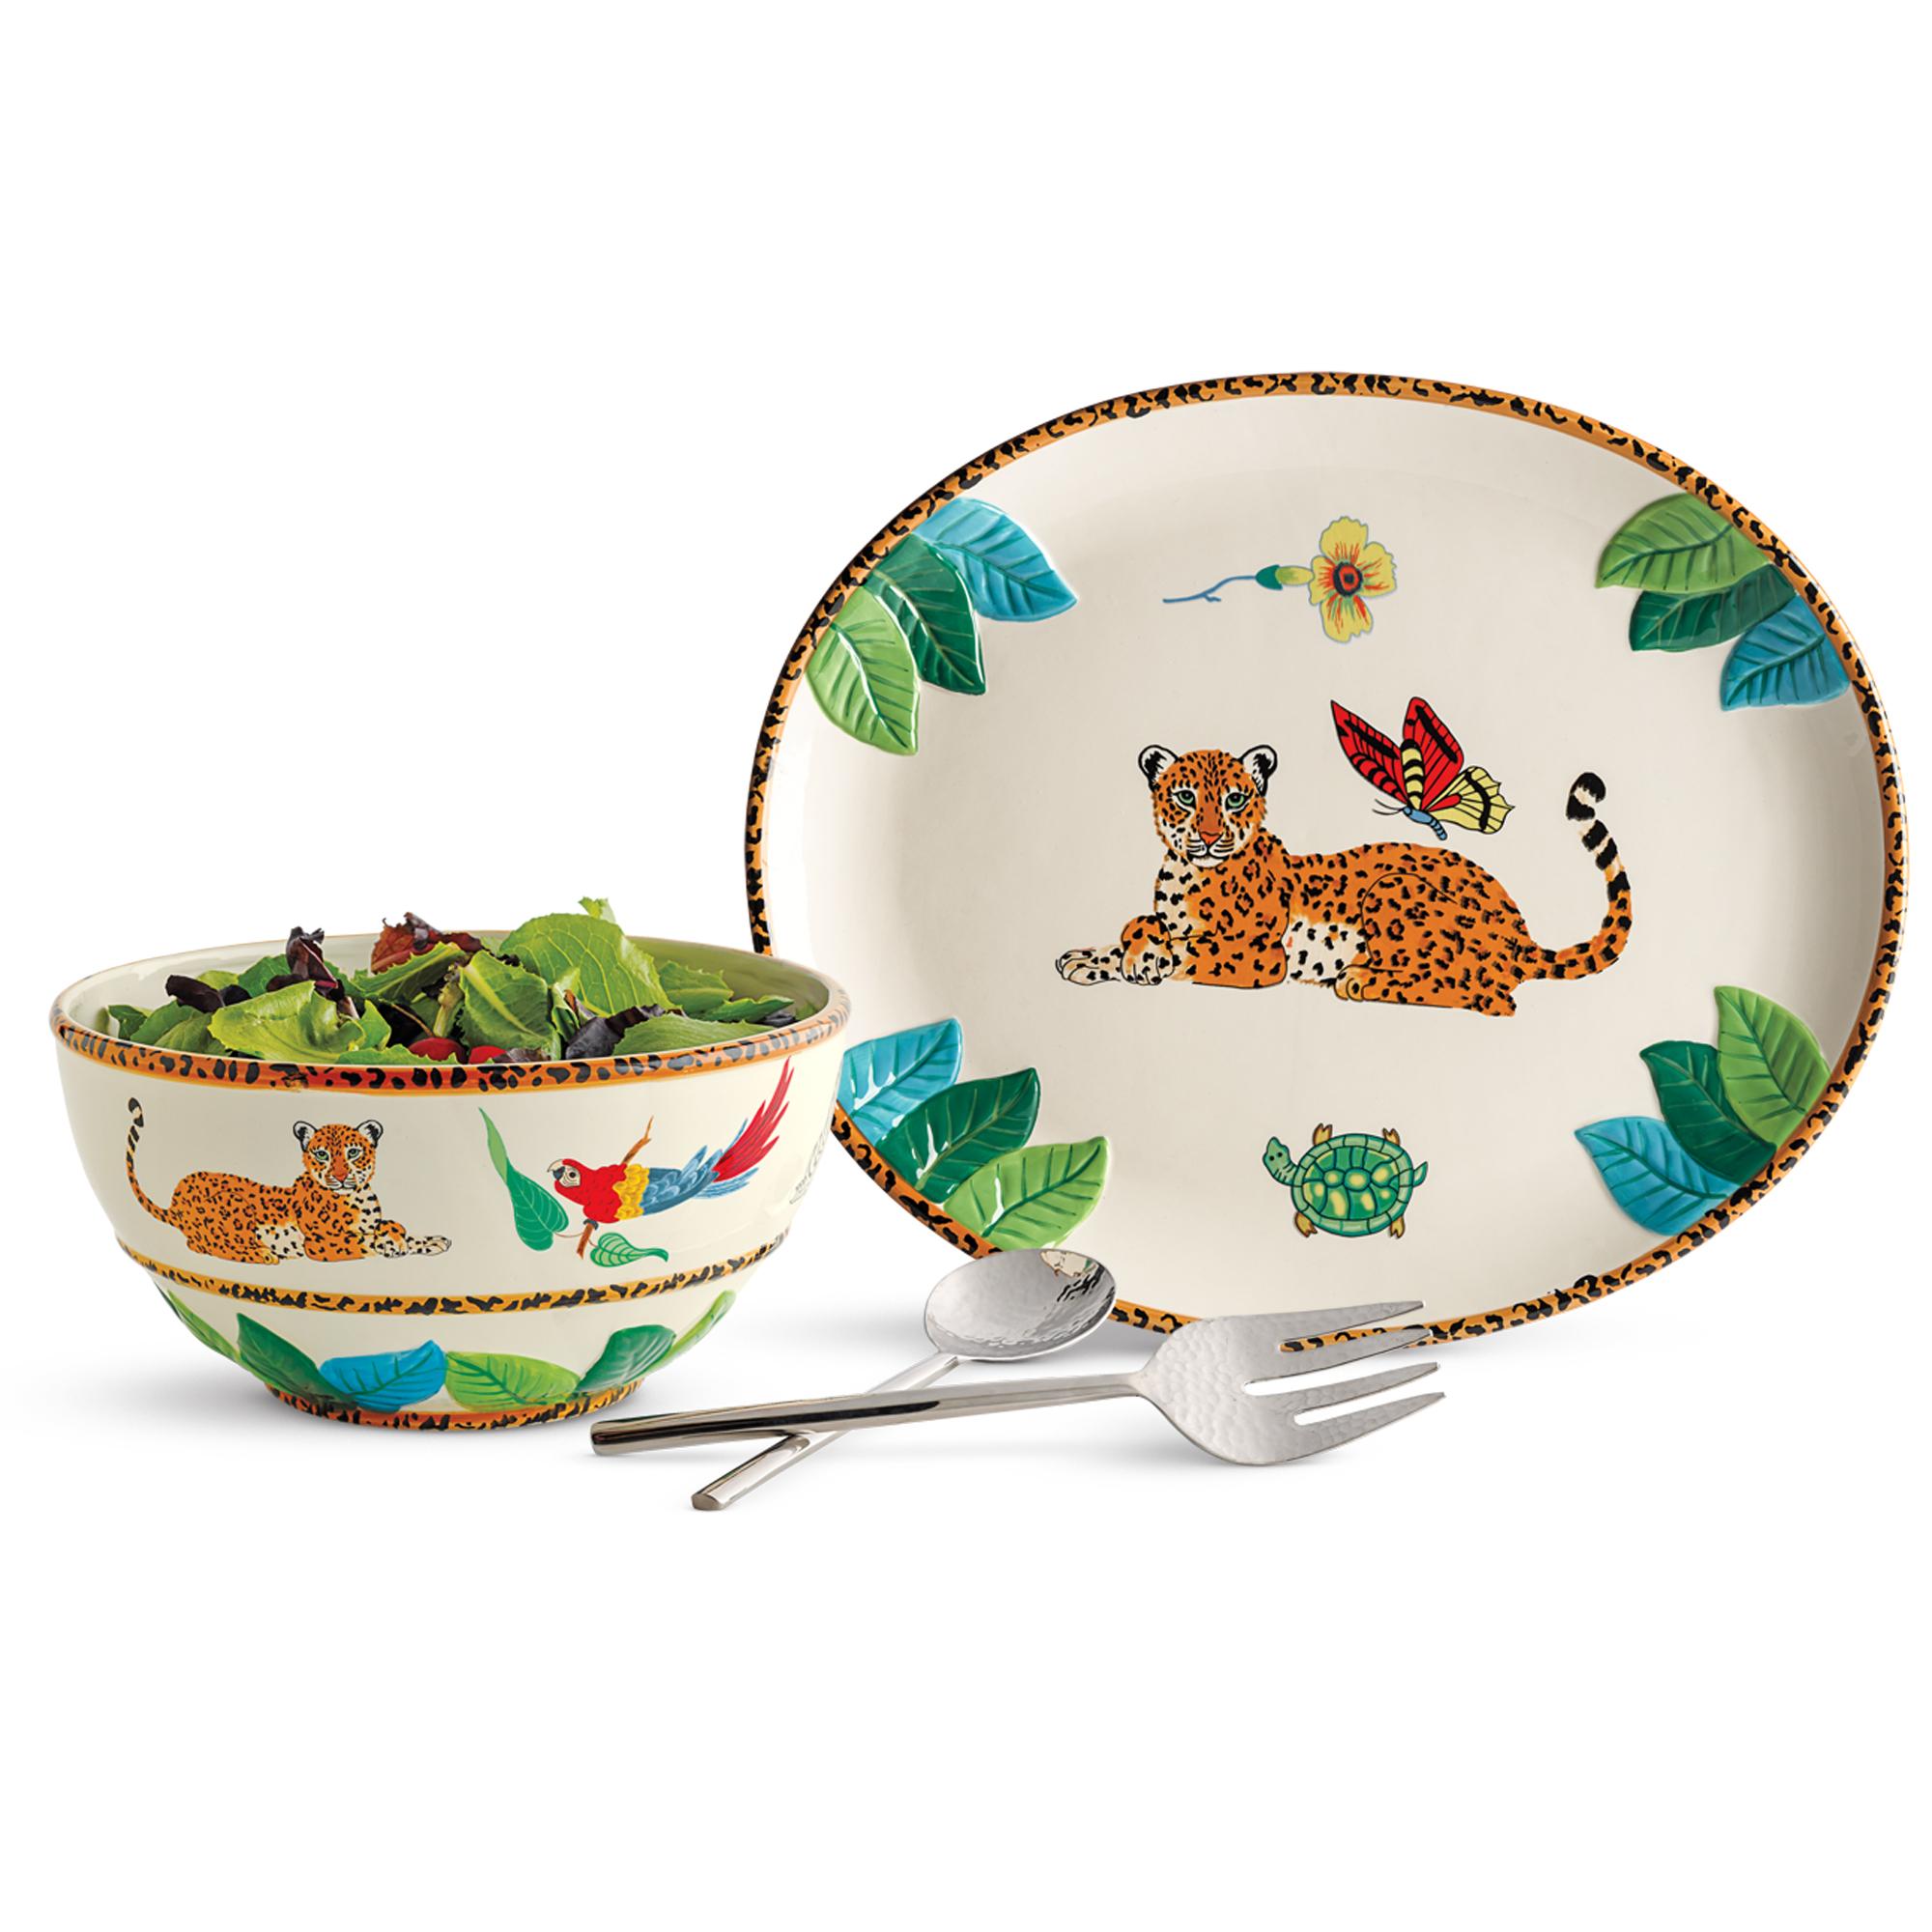 sc 1 st  Gumpu0027s & Lynn Chase Jungle Jubilee Dinnerware | Gumpu0027s